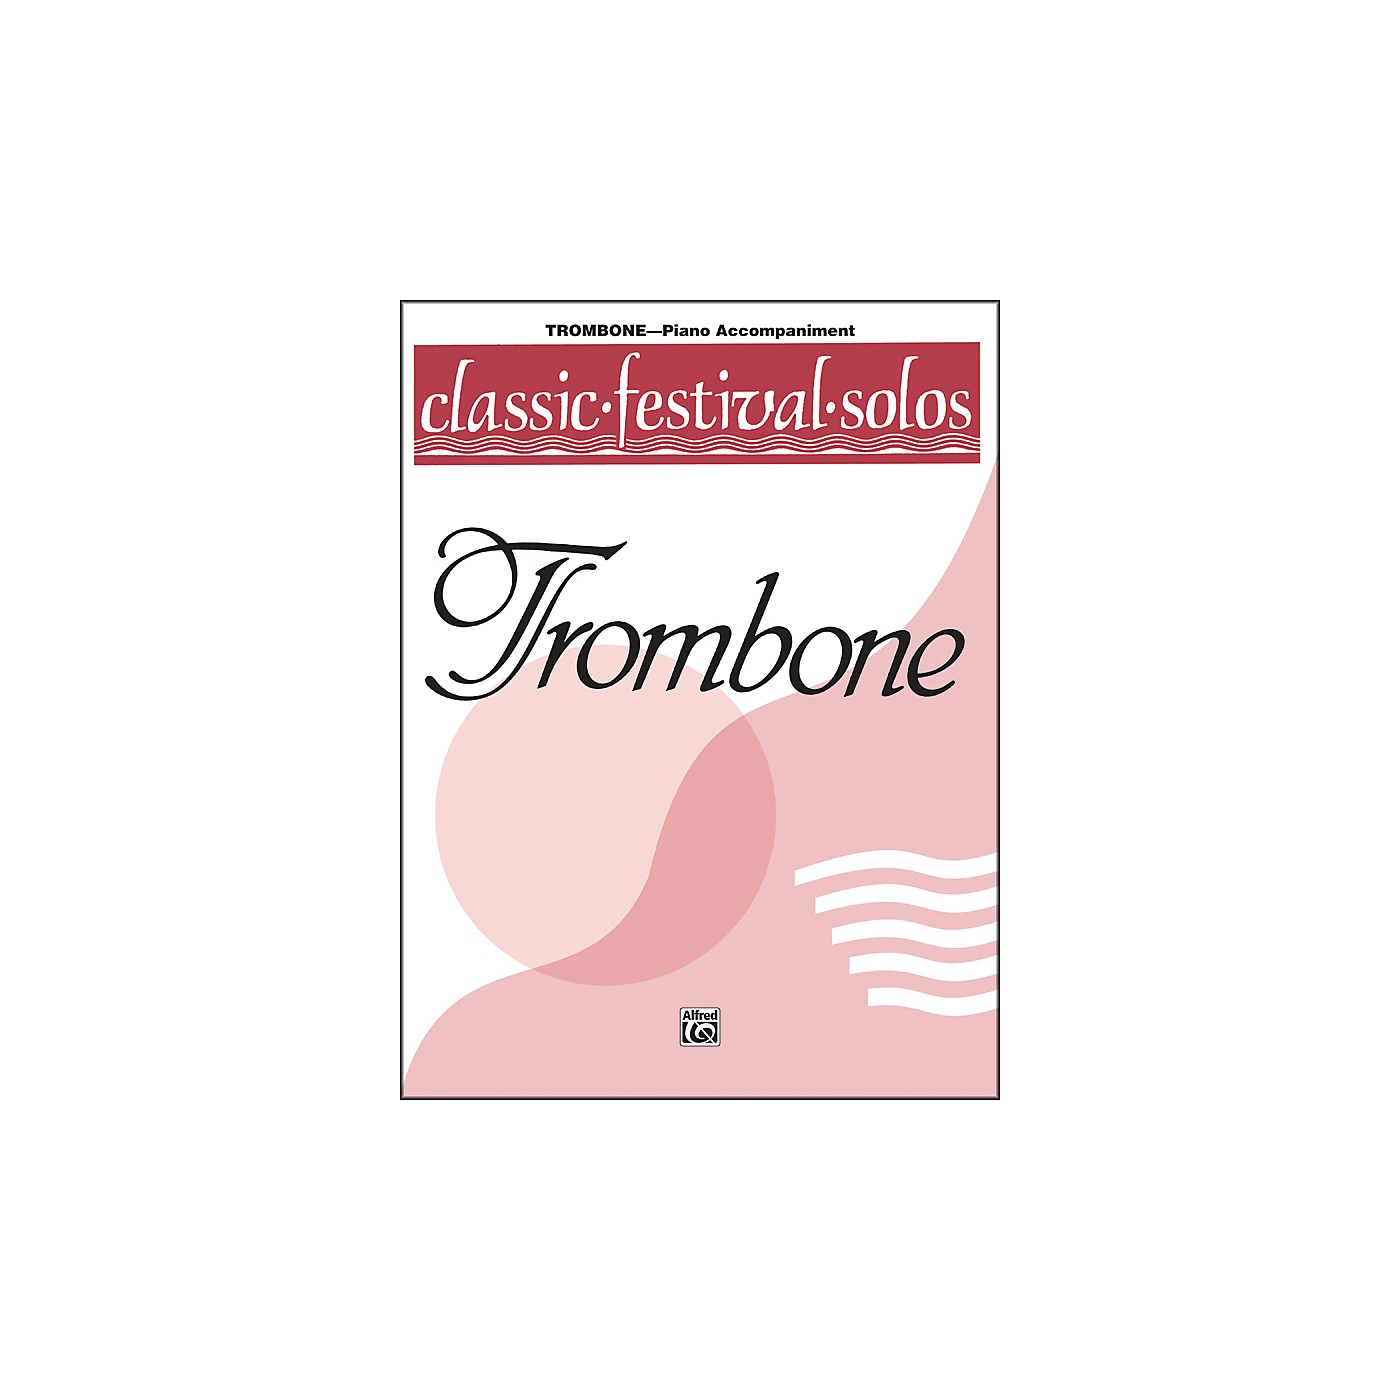 Alfred Classic Festival Solos (Trombone) Volume 1 Piano Acc. thumbnail